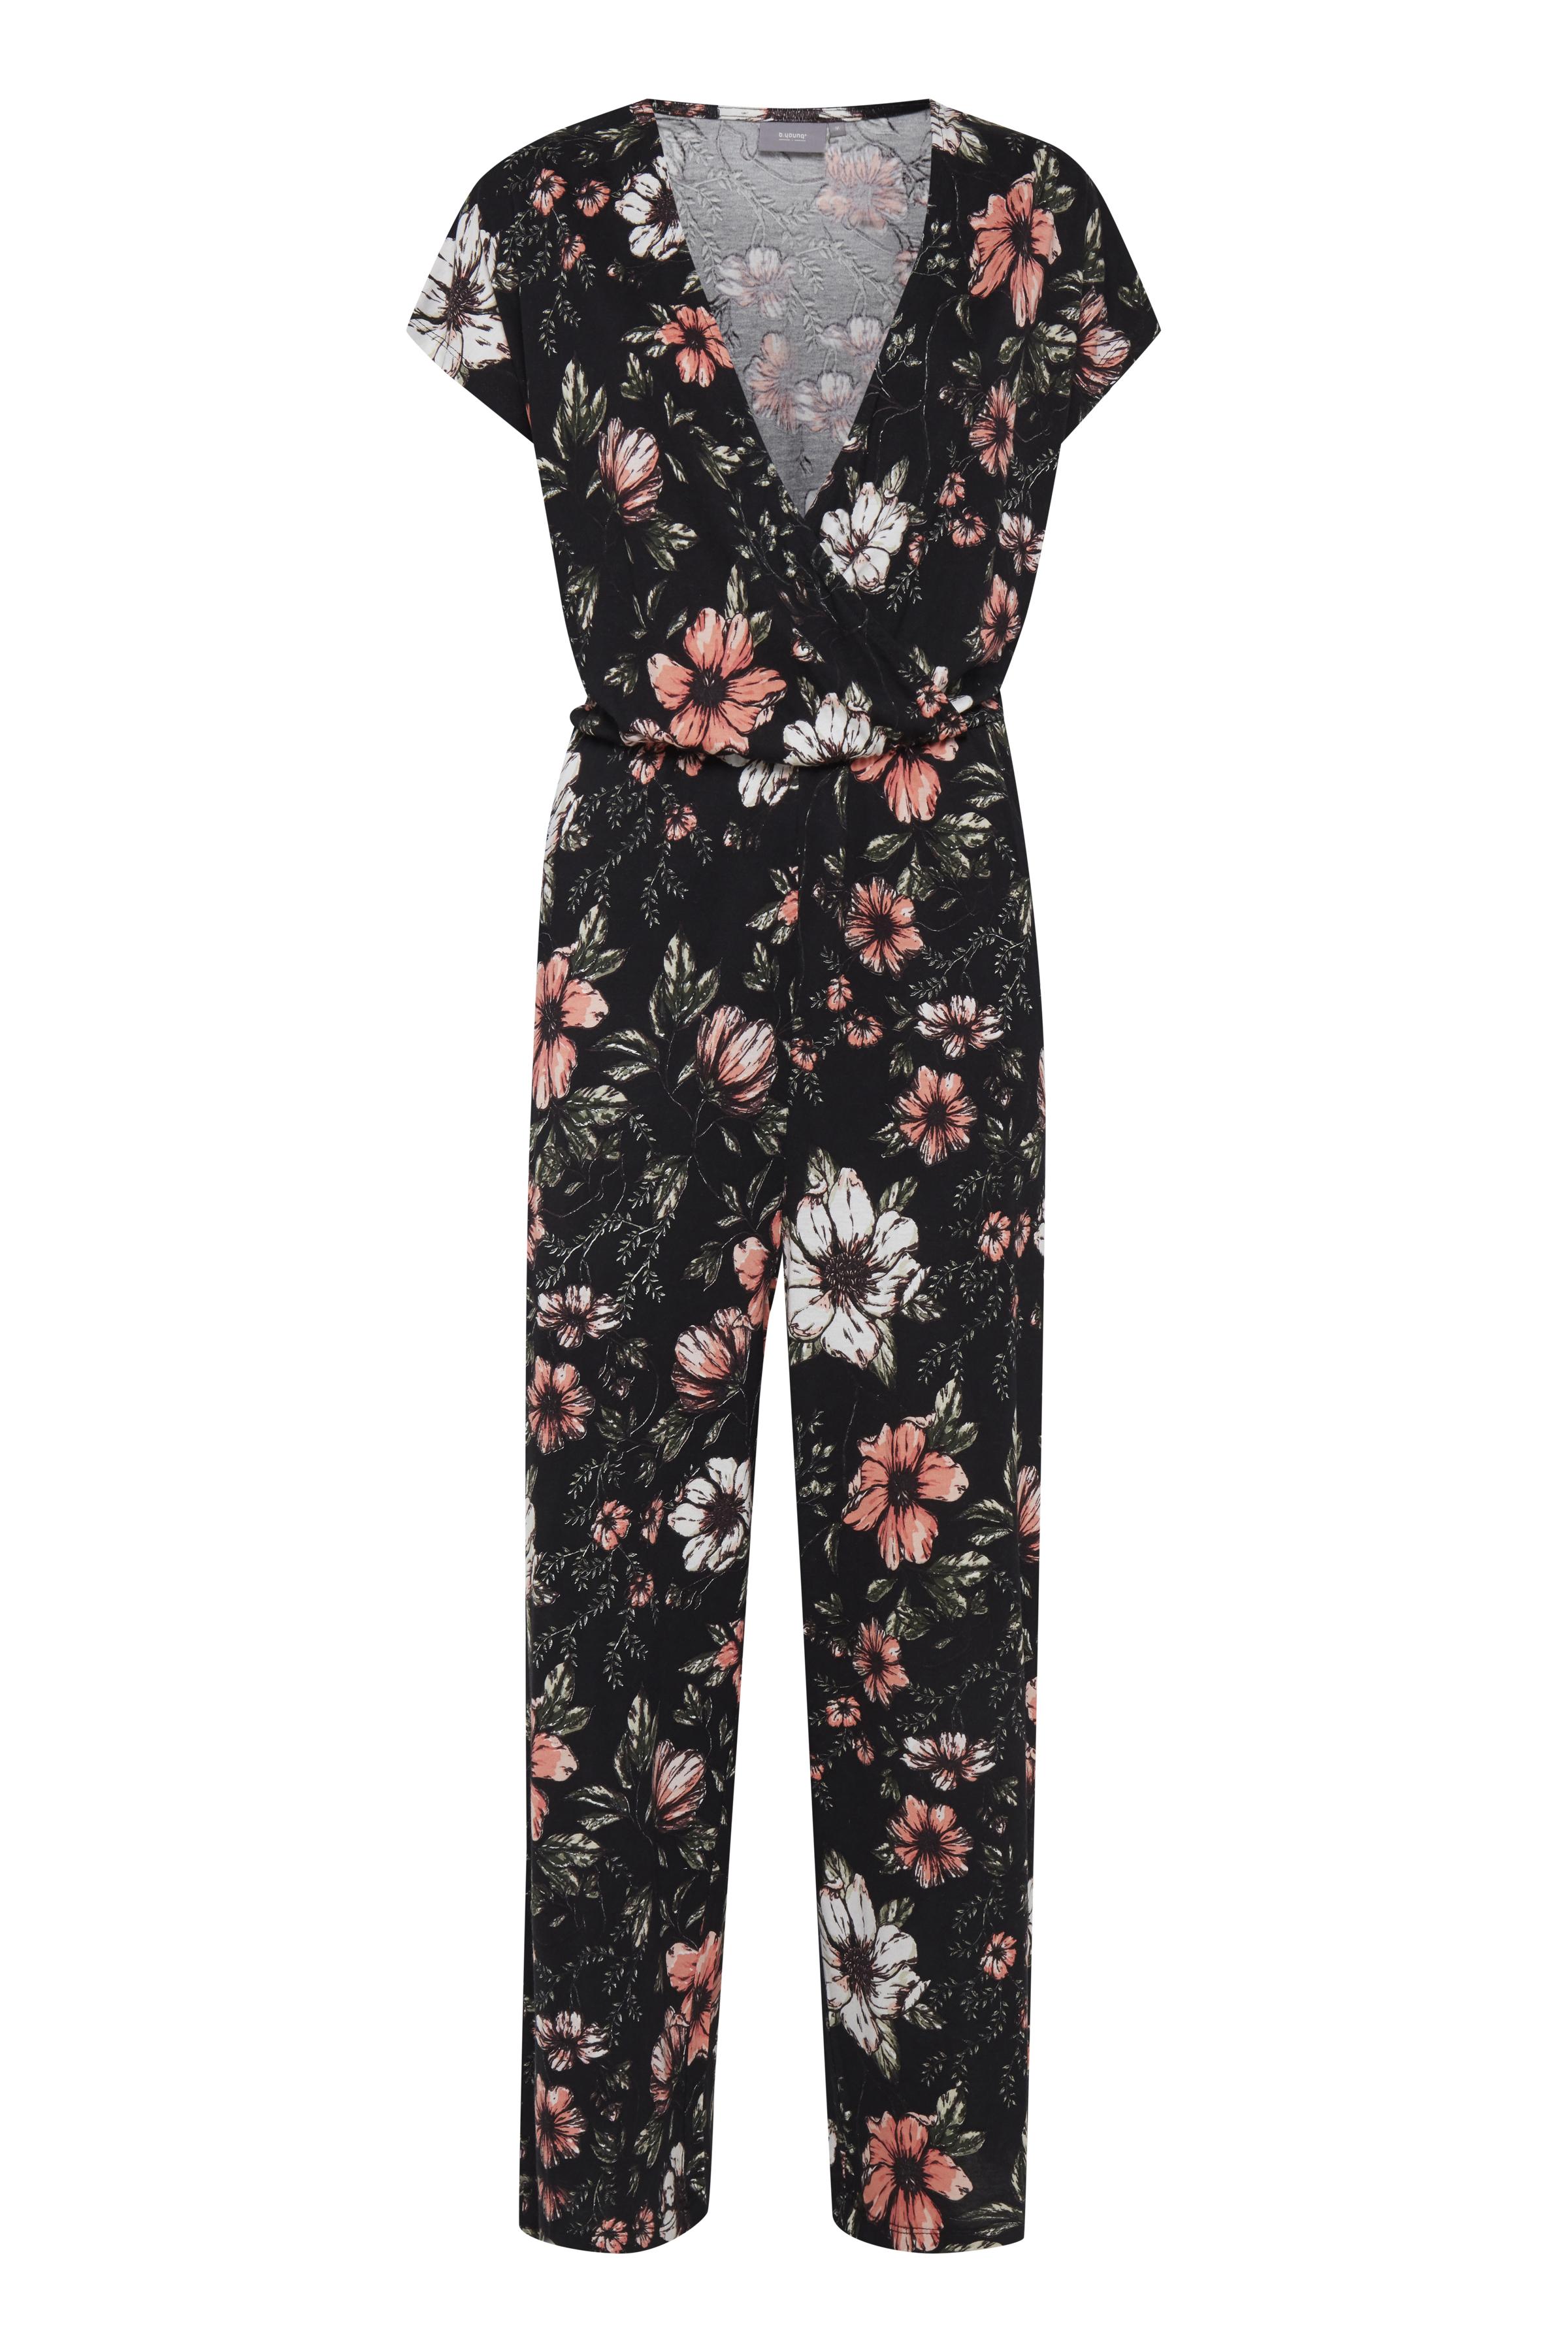 b.young Dame Jumpsuits - Sort/koral